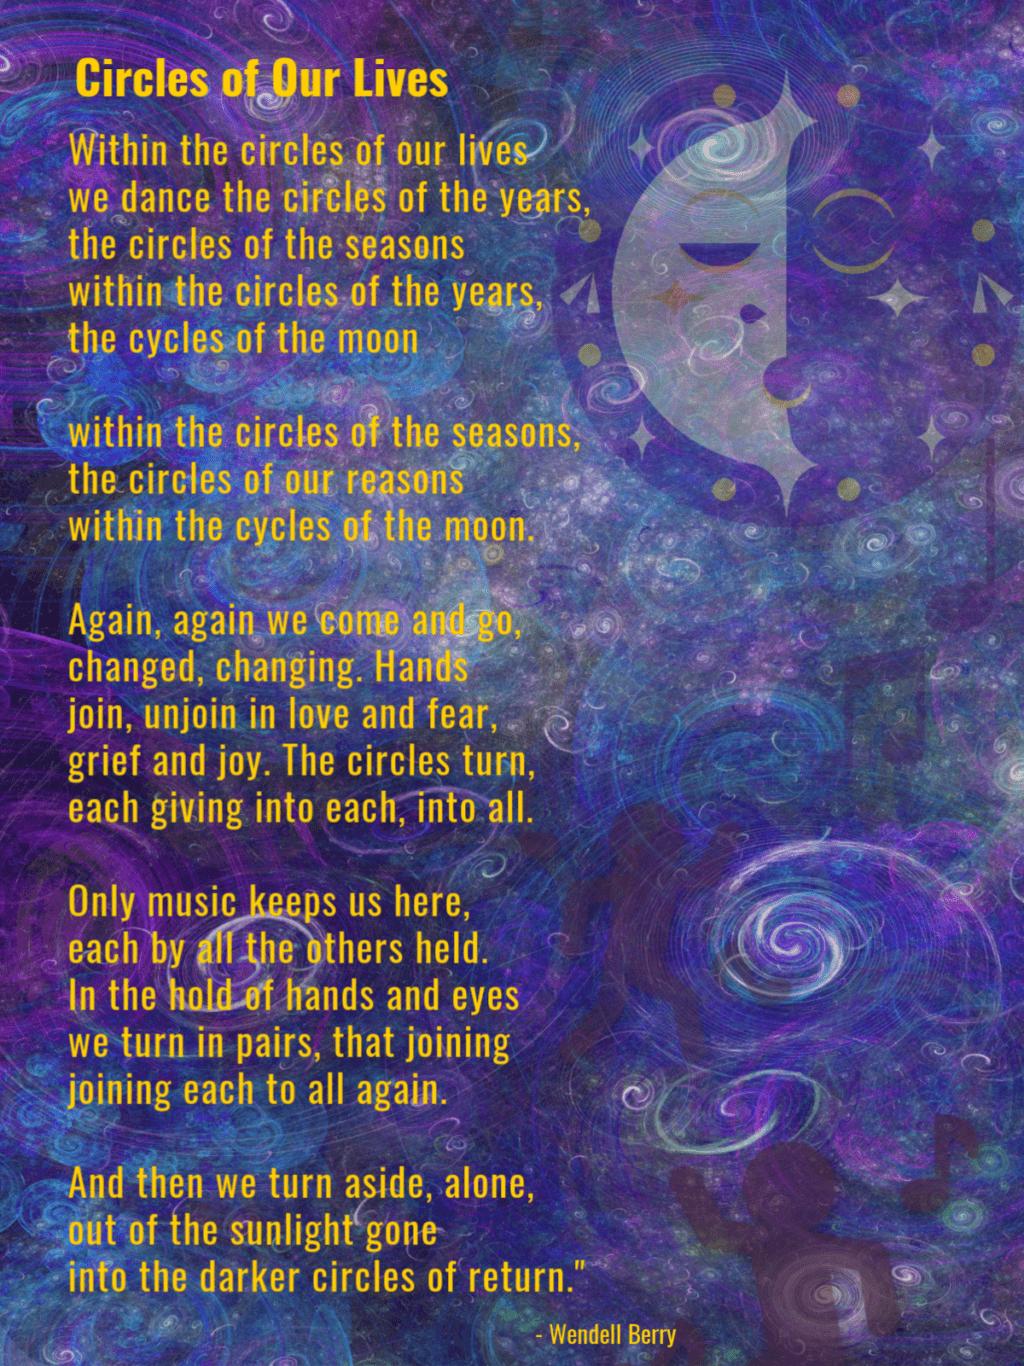 05/24/2020 - Ascension Sunday